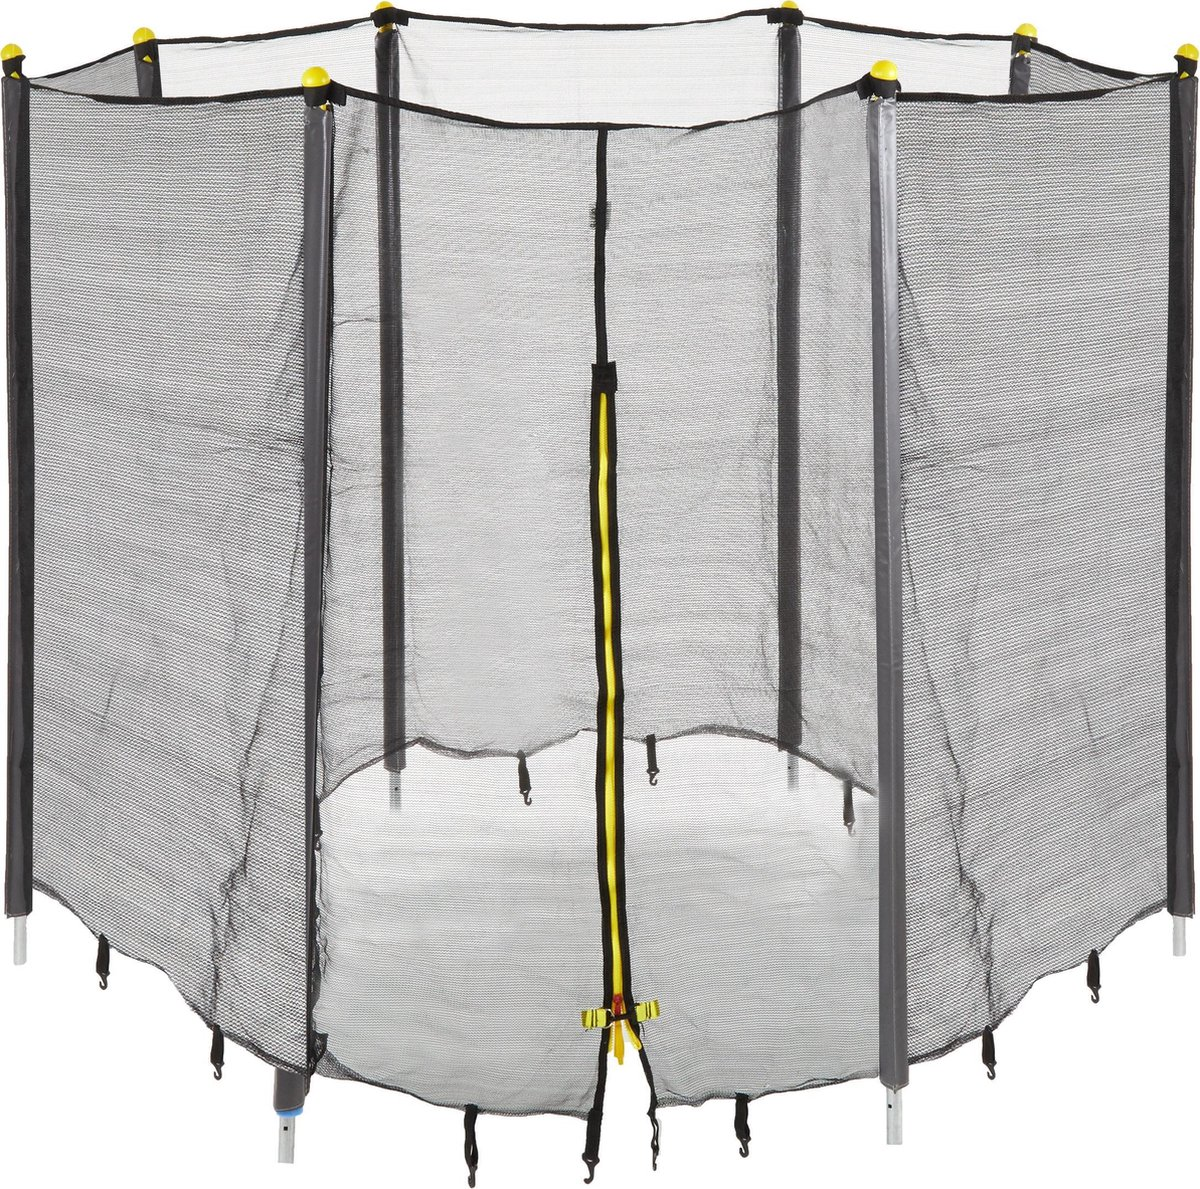 relaxdays Trampoline veiligheidsnet - net trampoline - trampolinenet - vangnet - met palen 366 cm